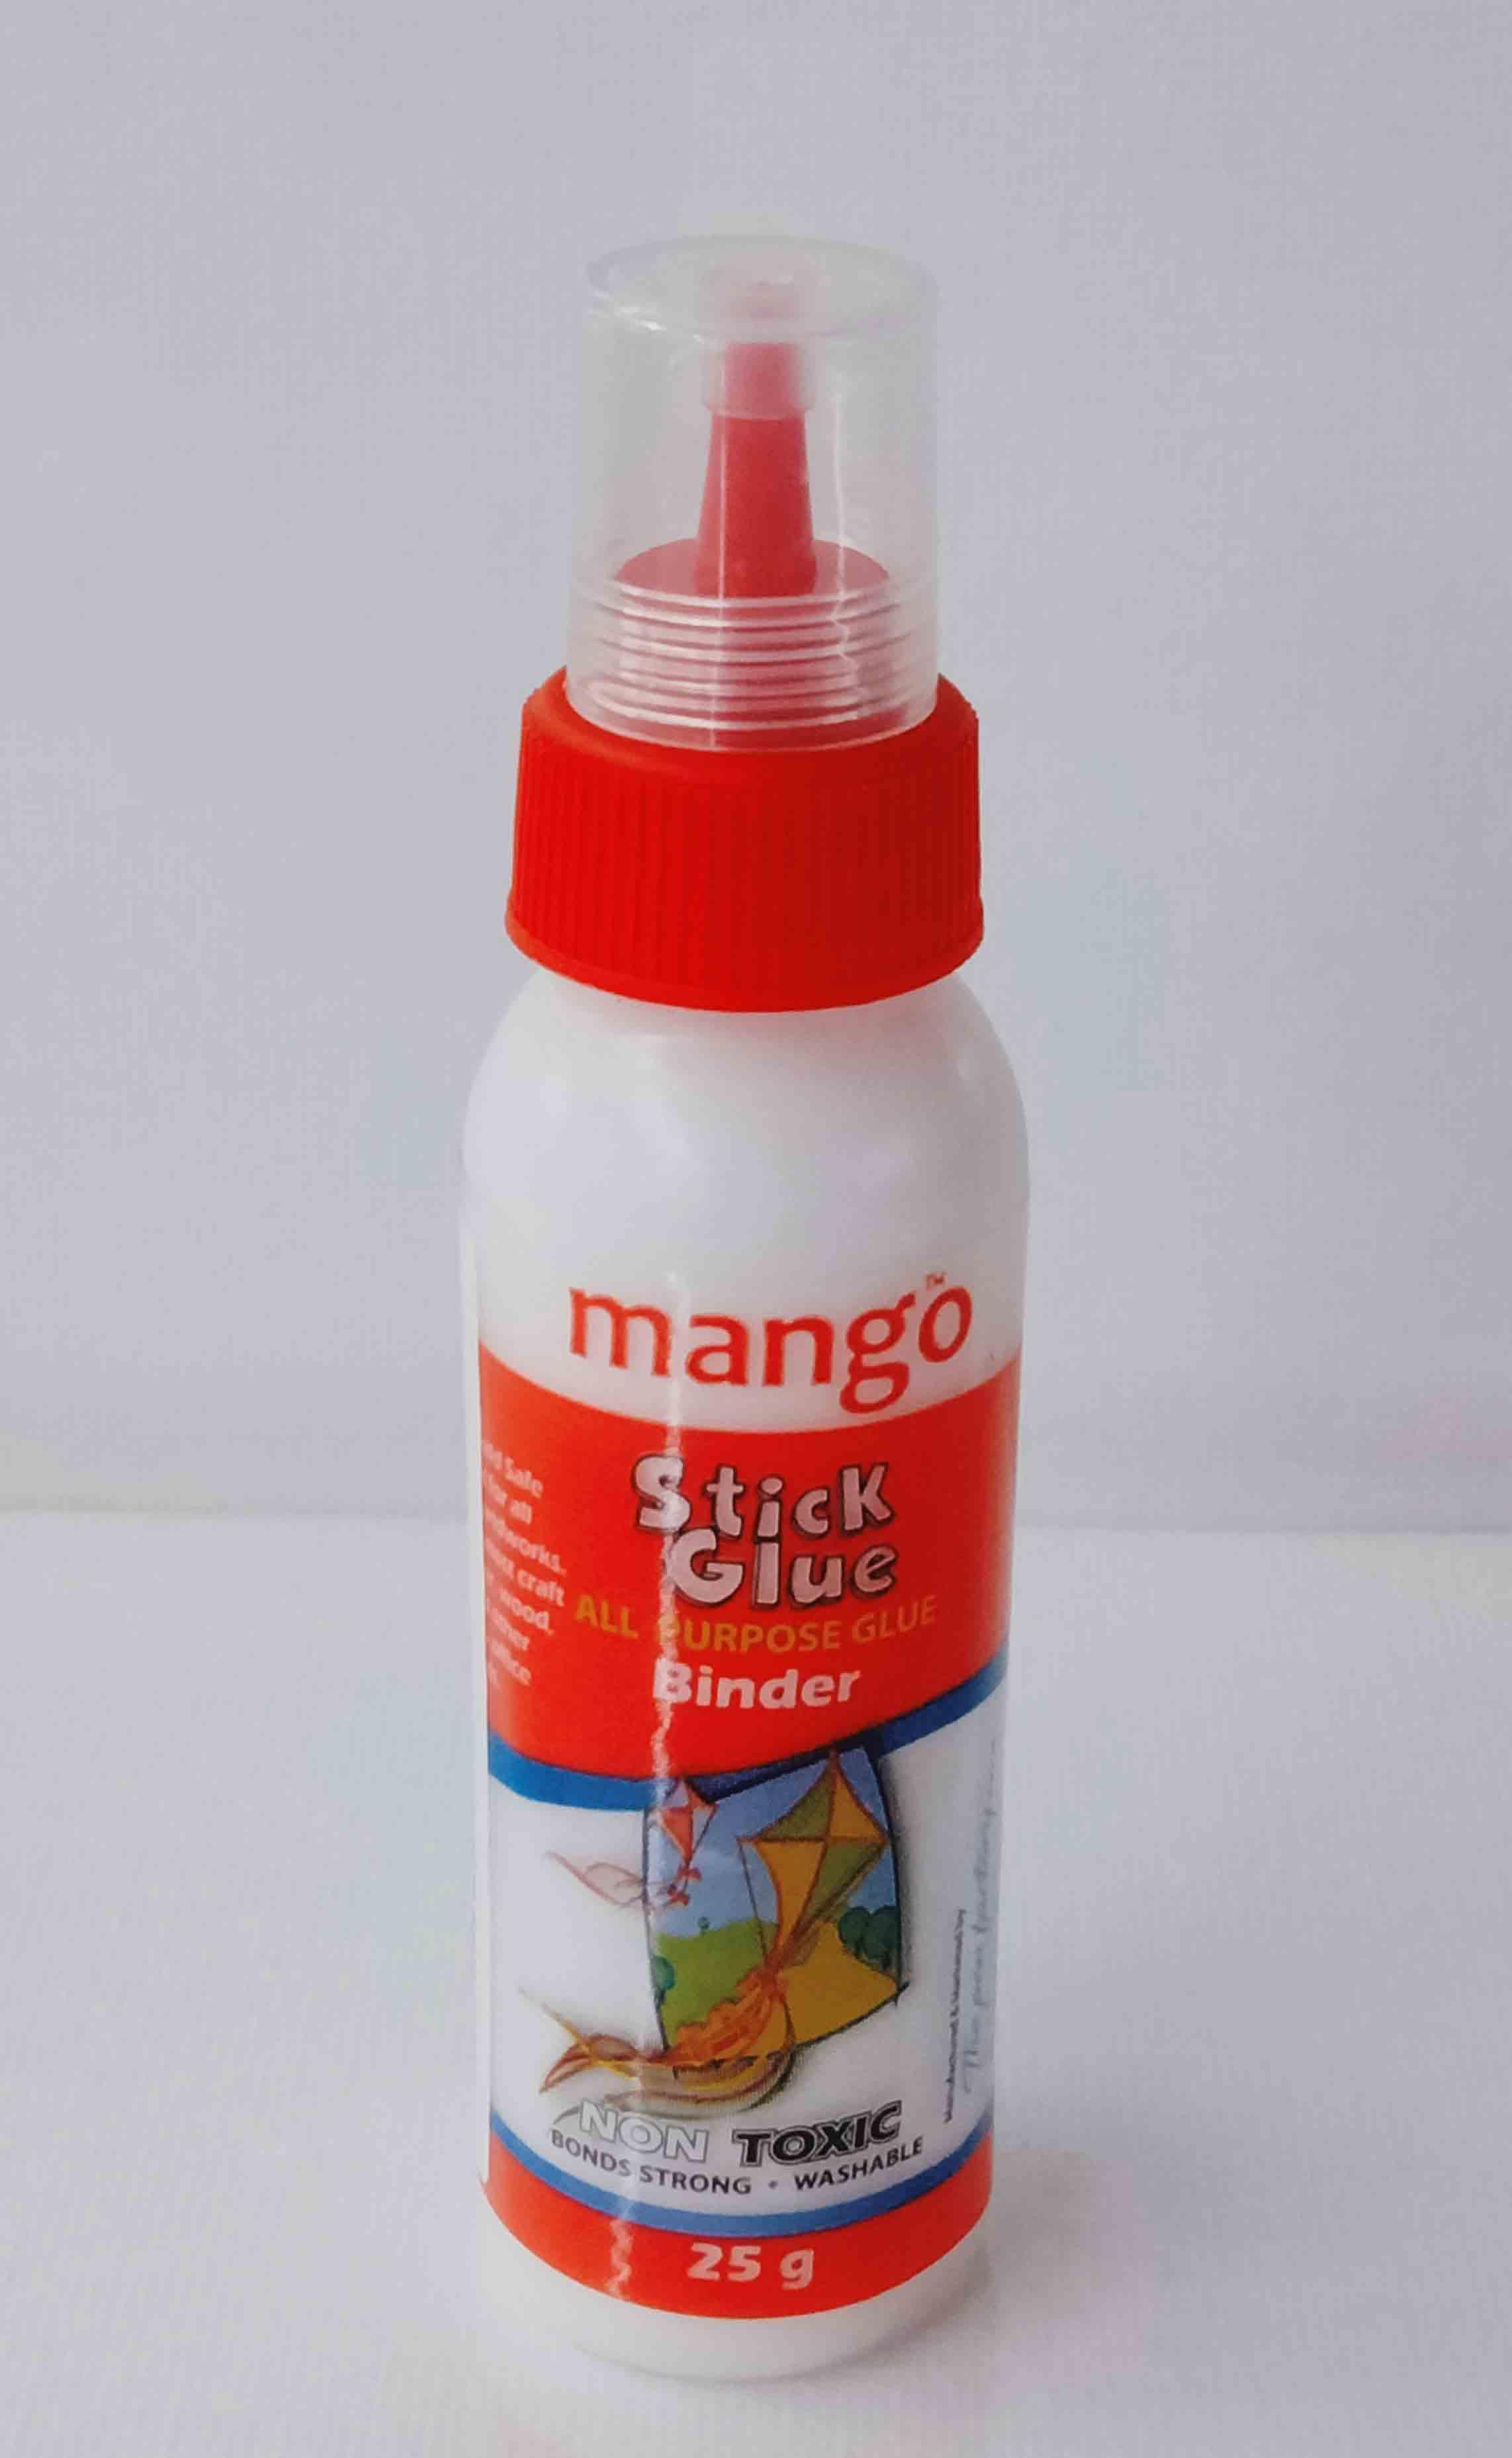 MANGO STICK GLUE BINDER - 25ML - 008008859